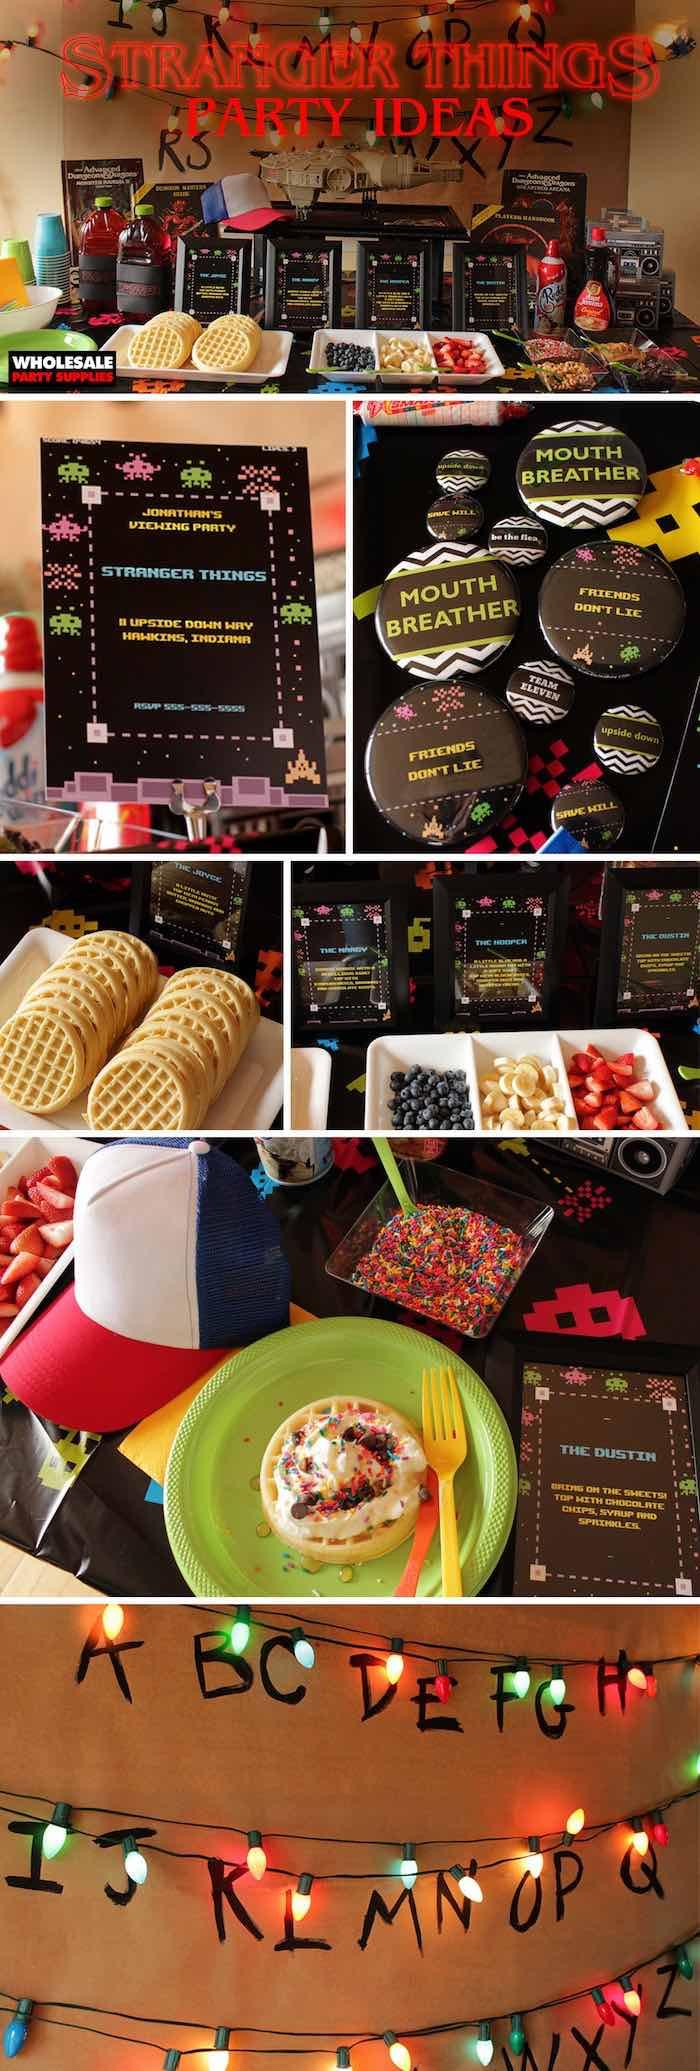 Stranger Things Halloween Party on Kara's Party Ideas | KarasPartyIdeas.com